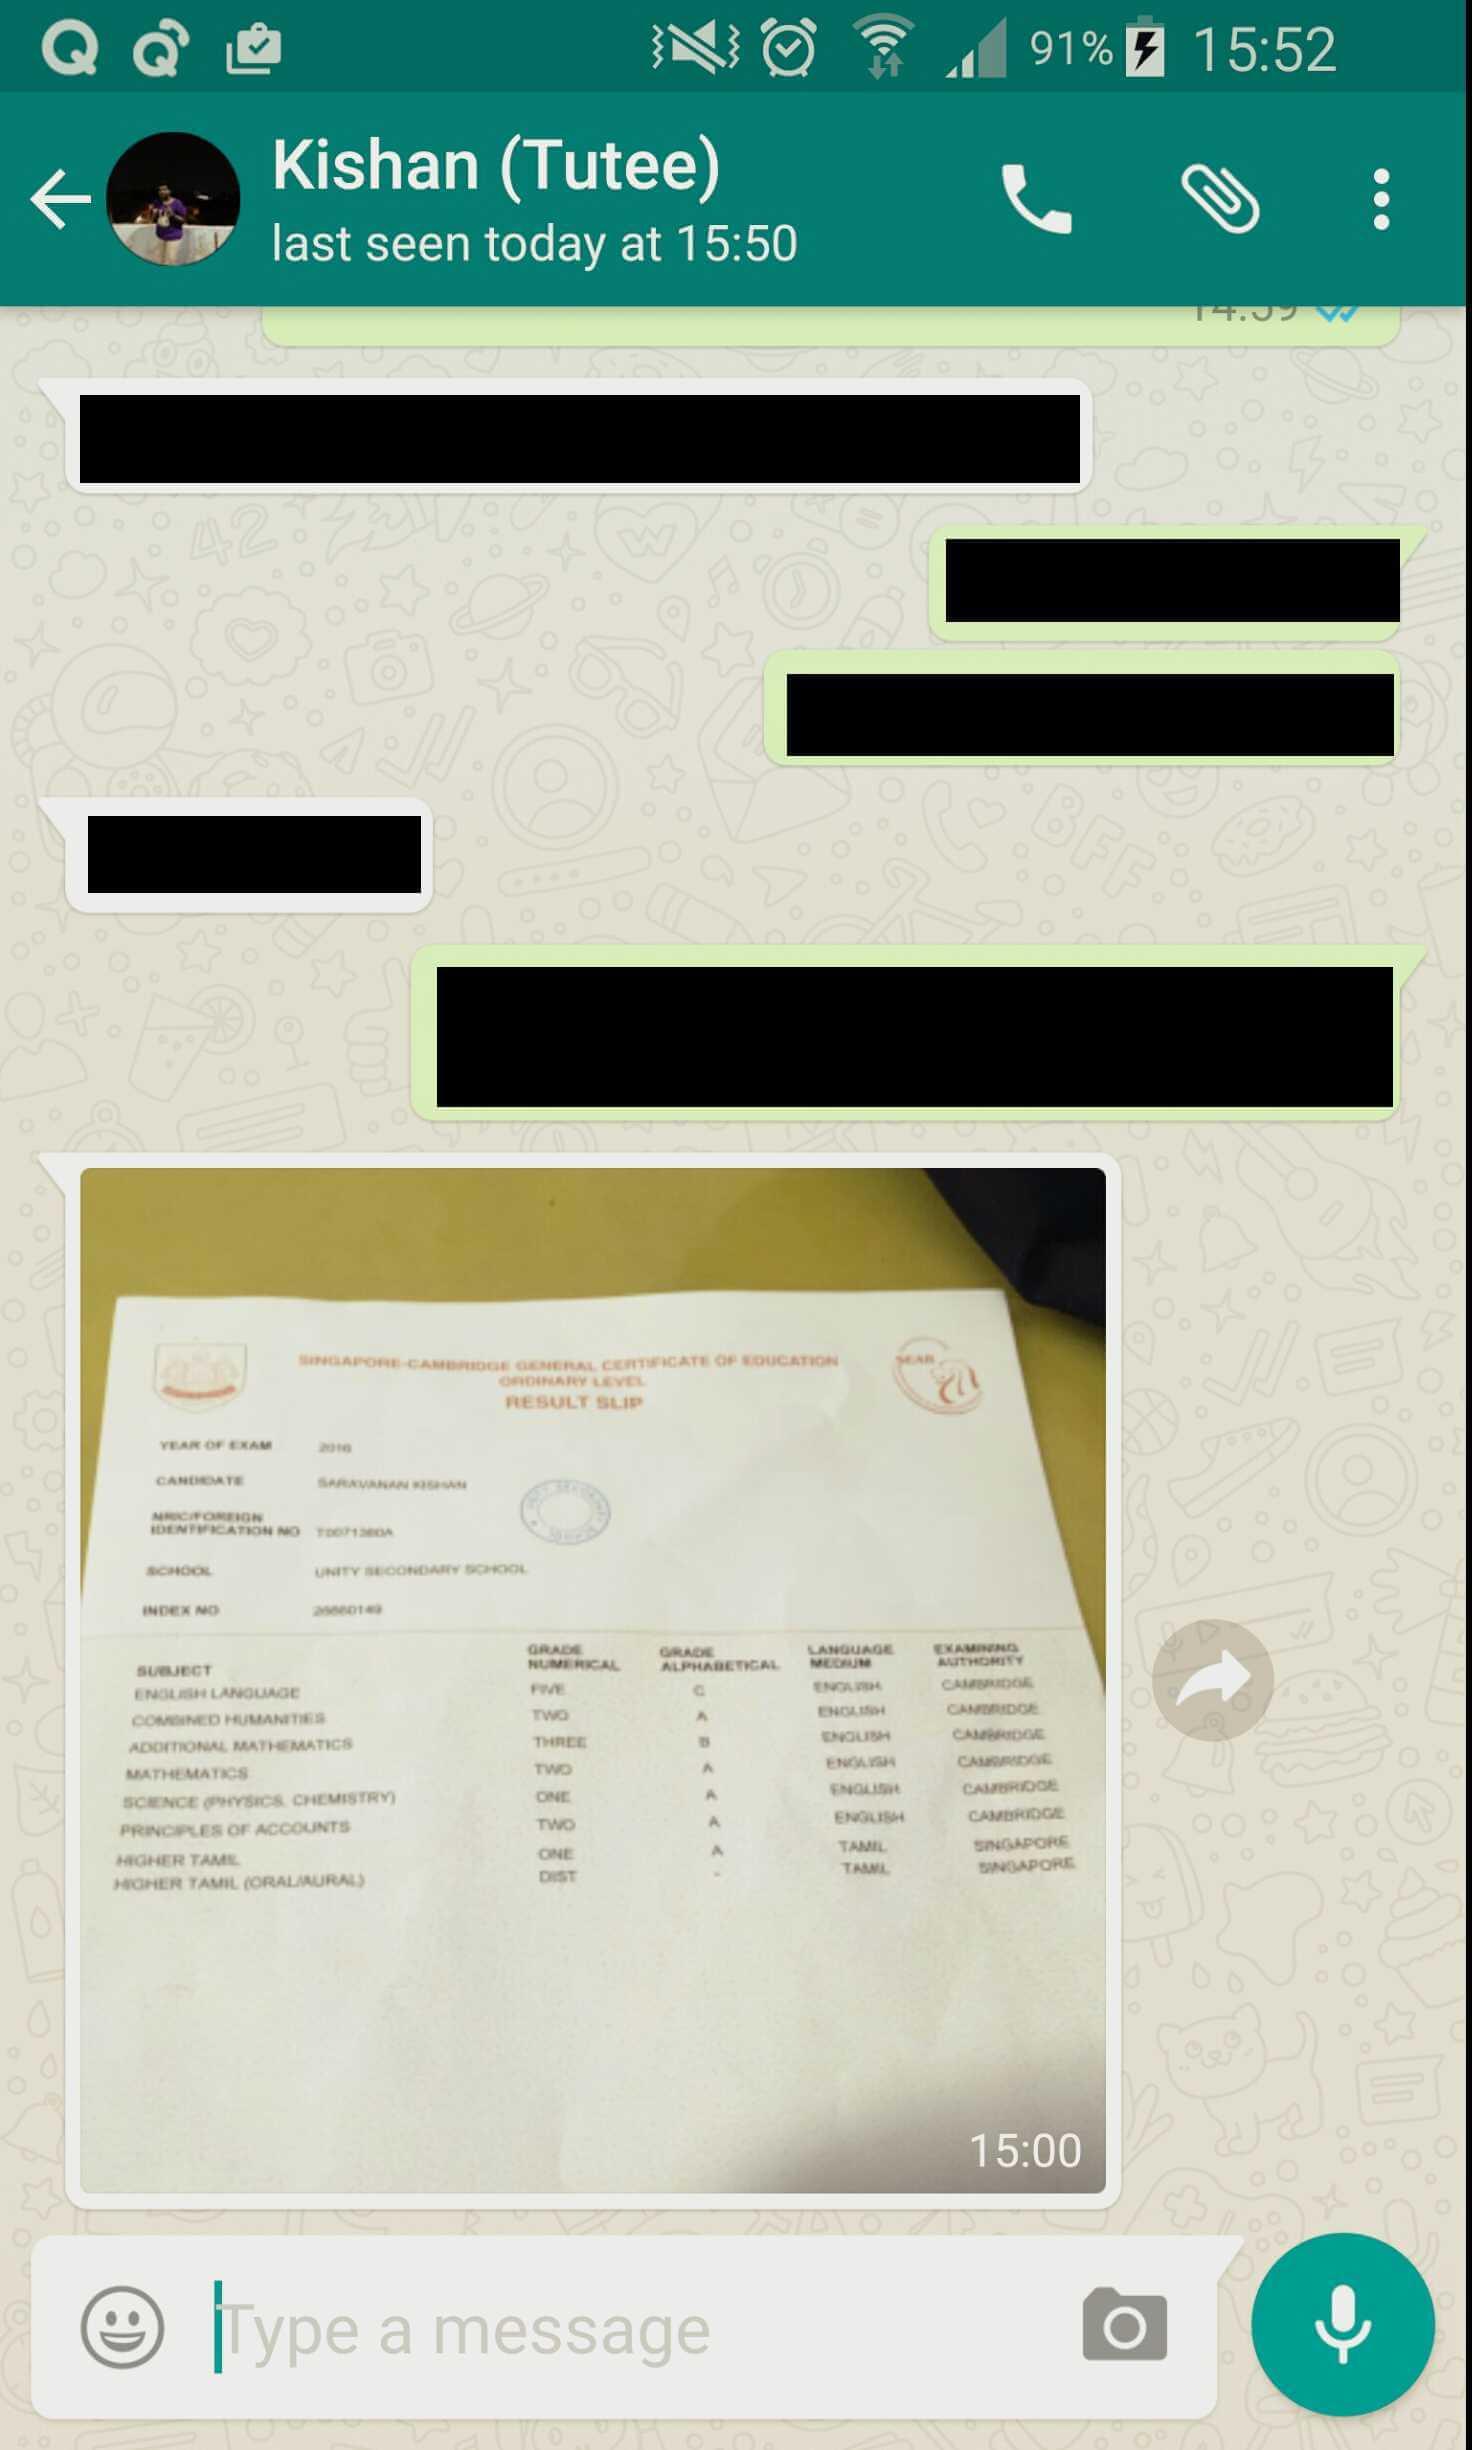 POA Tuition Testimonials, ACE Your Principles of Accounts POA Tuition Singapore